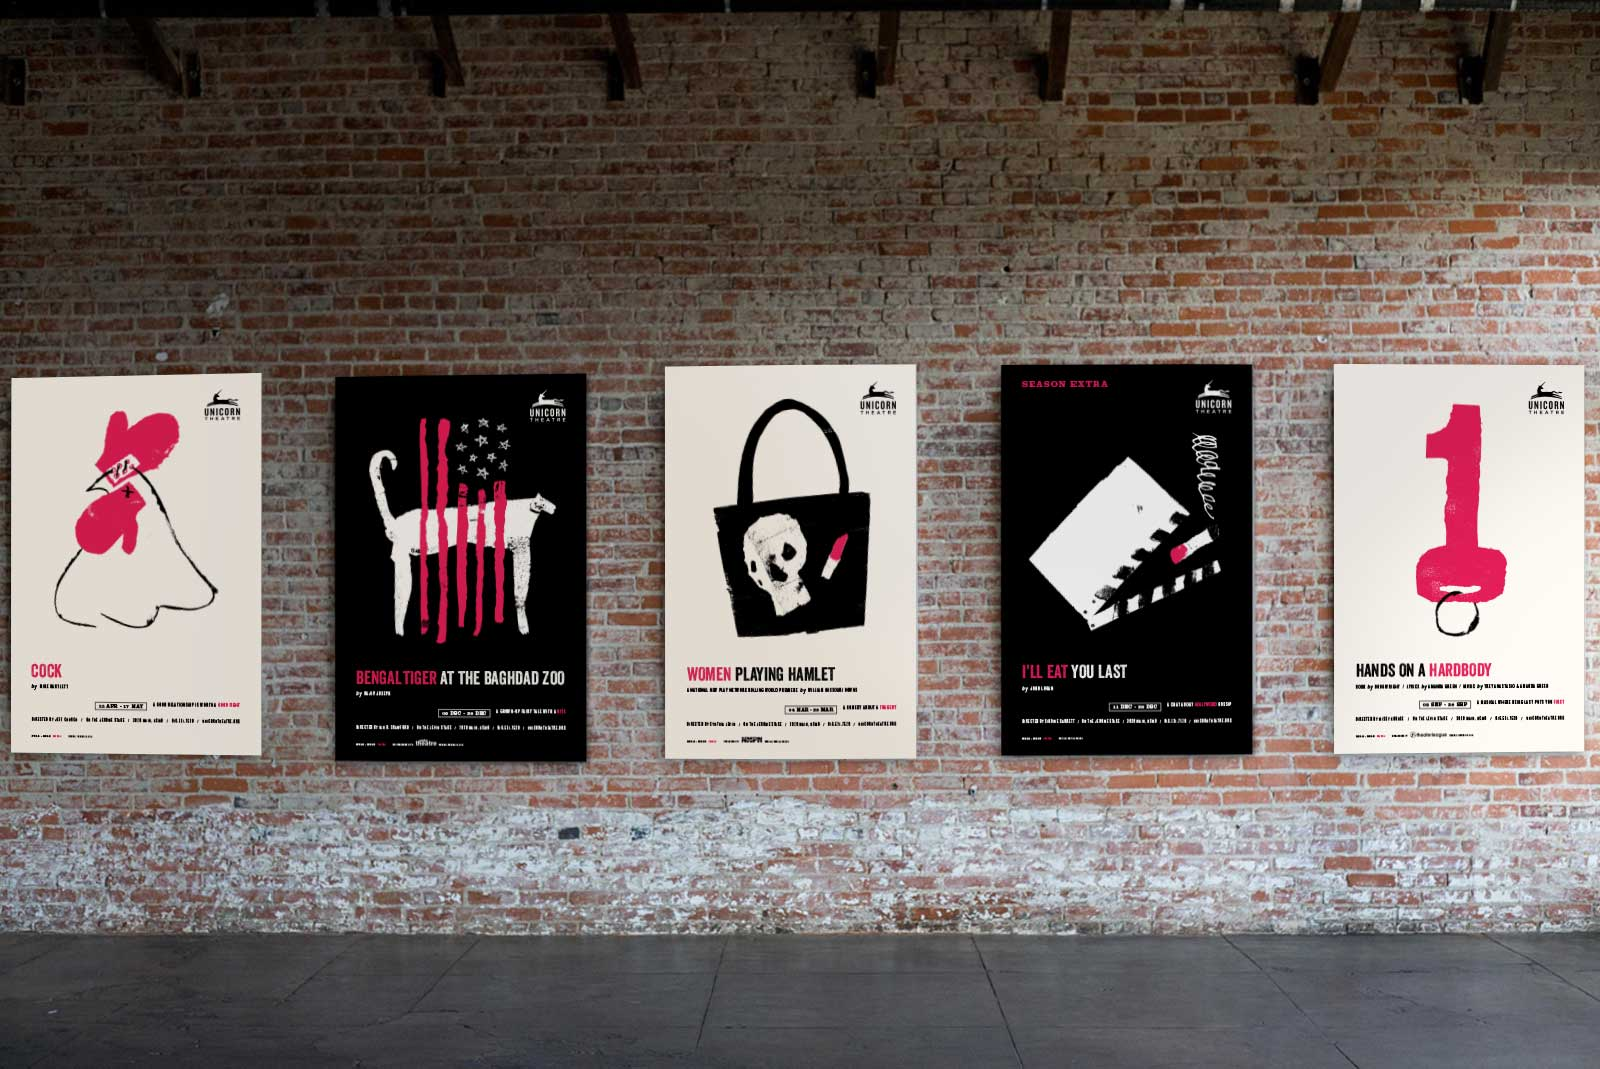 Poster design awards results 1_lg 7_lg 9_lg